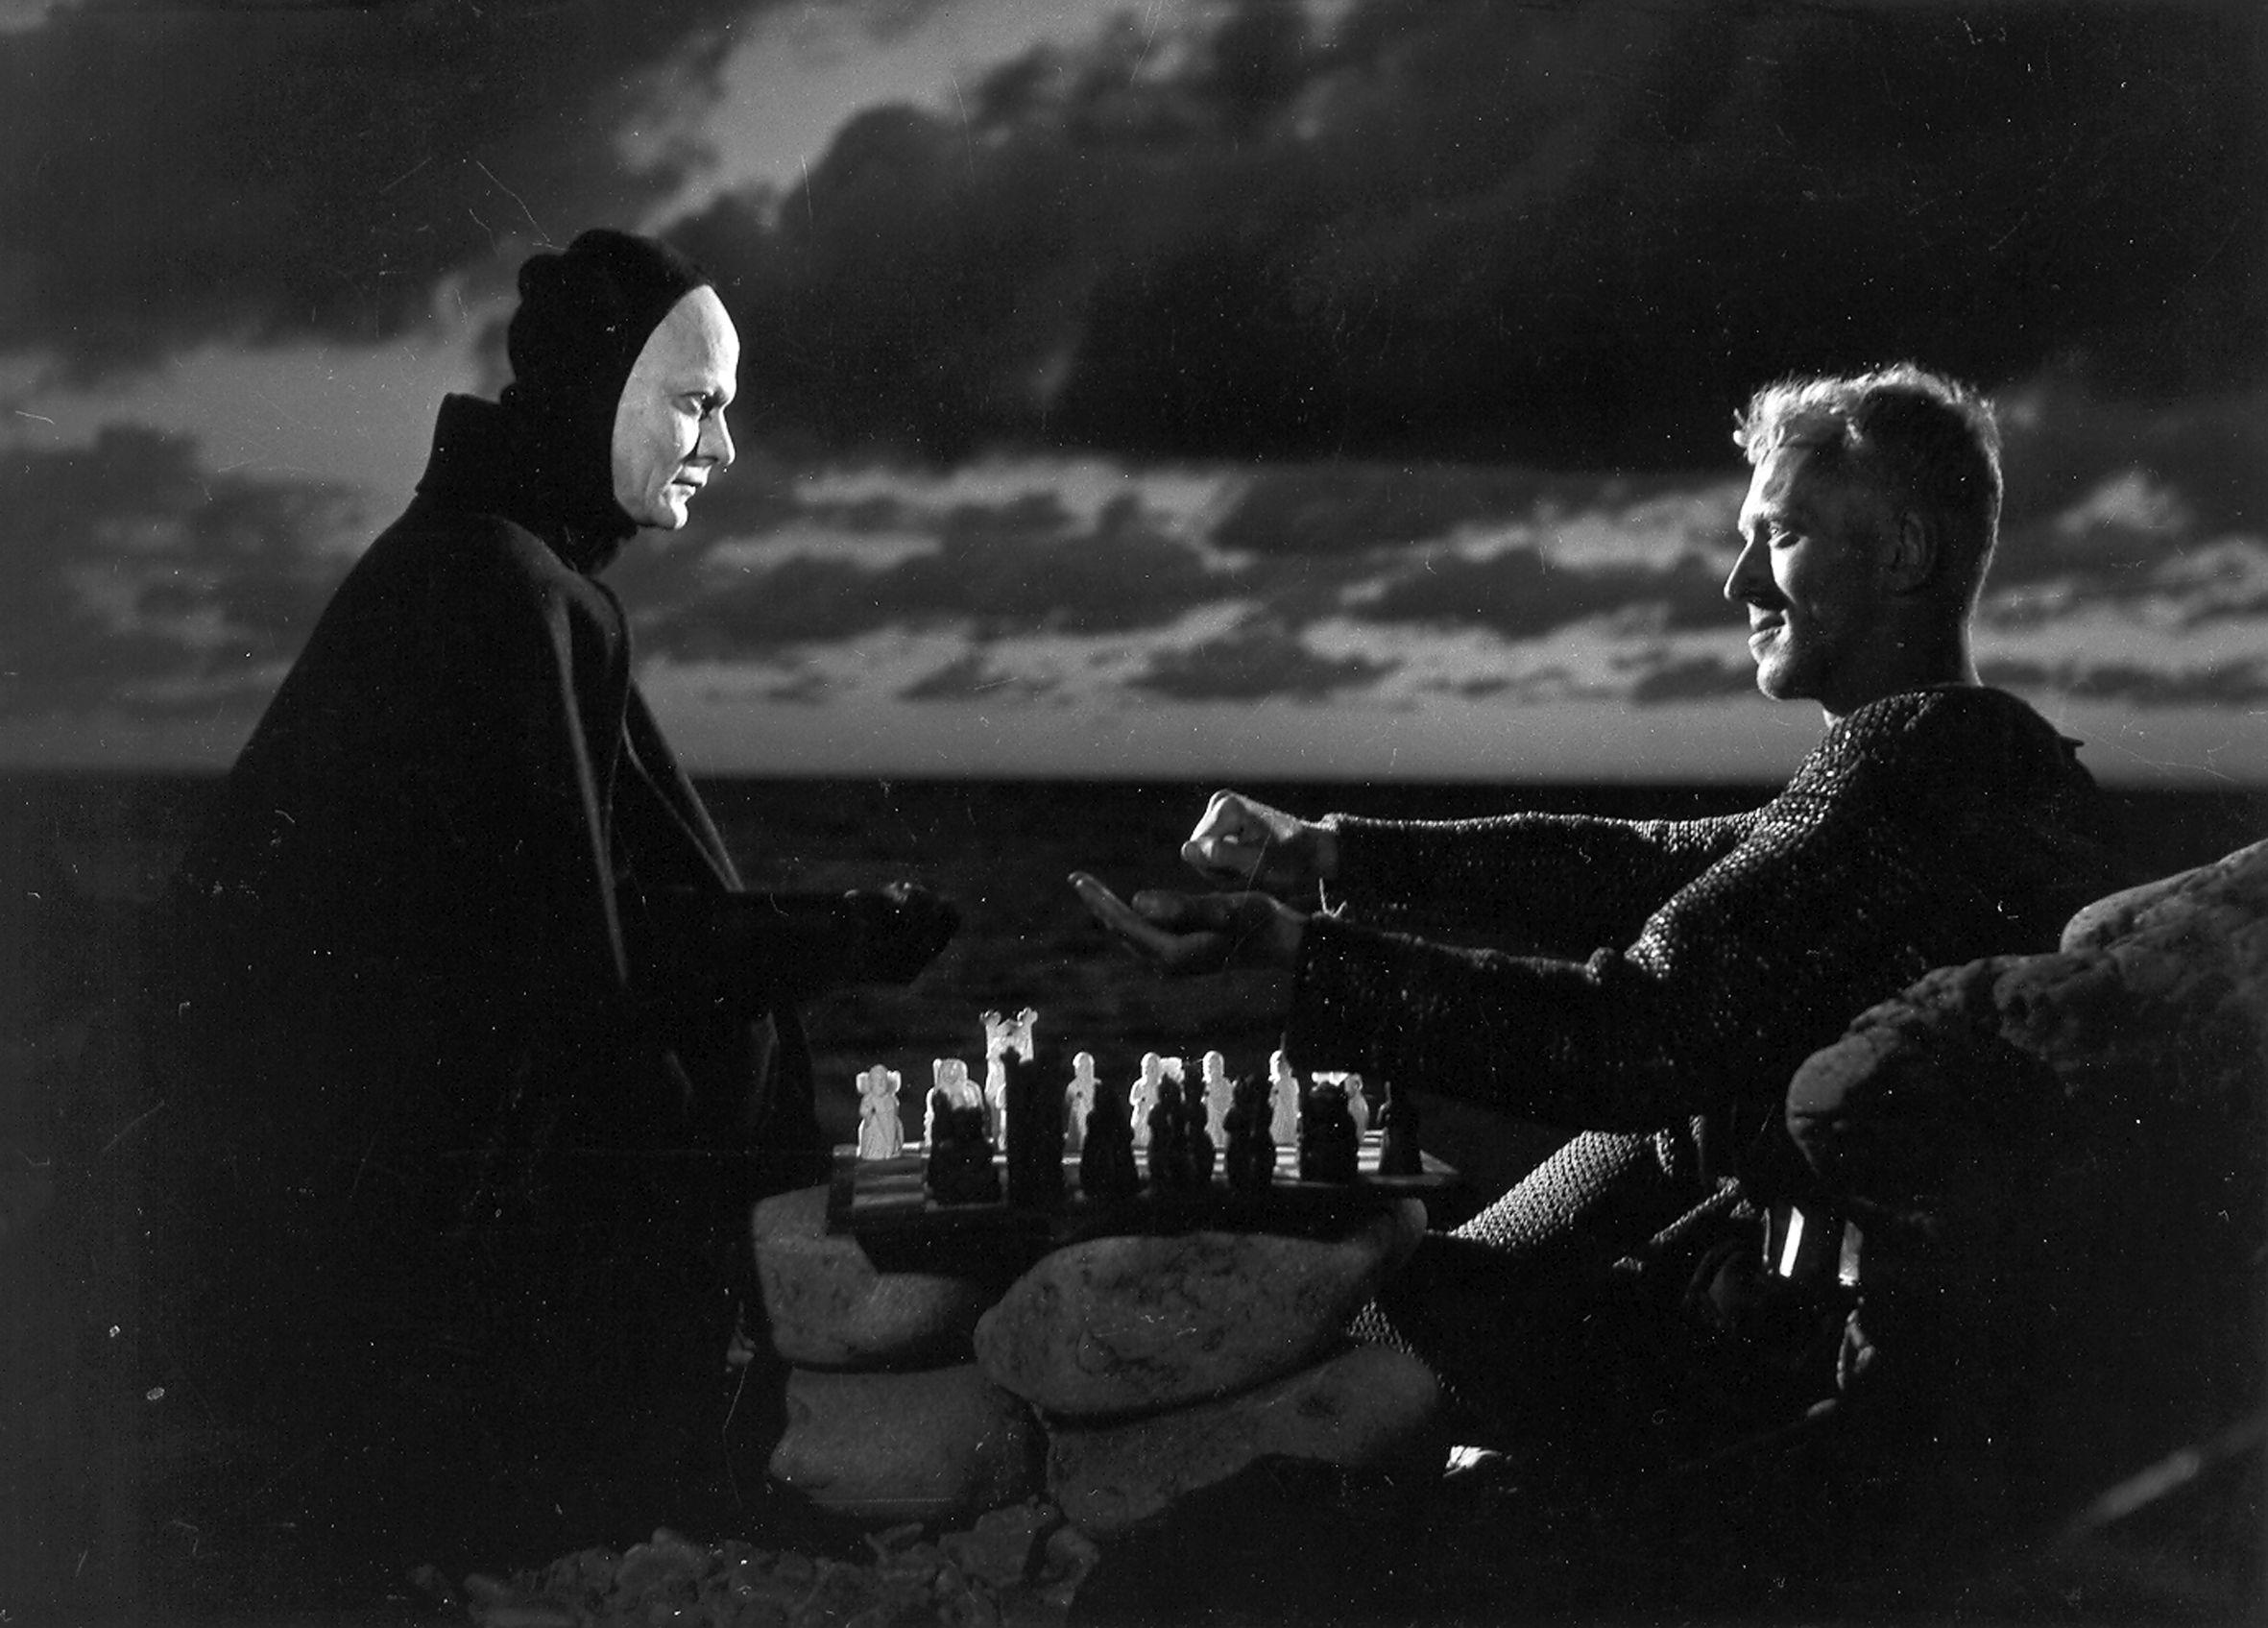 kadr z filmu SIÓDMA PIECZĘĆ | Det sjunde inseglet, 1957, reż. Ingmar Bergman